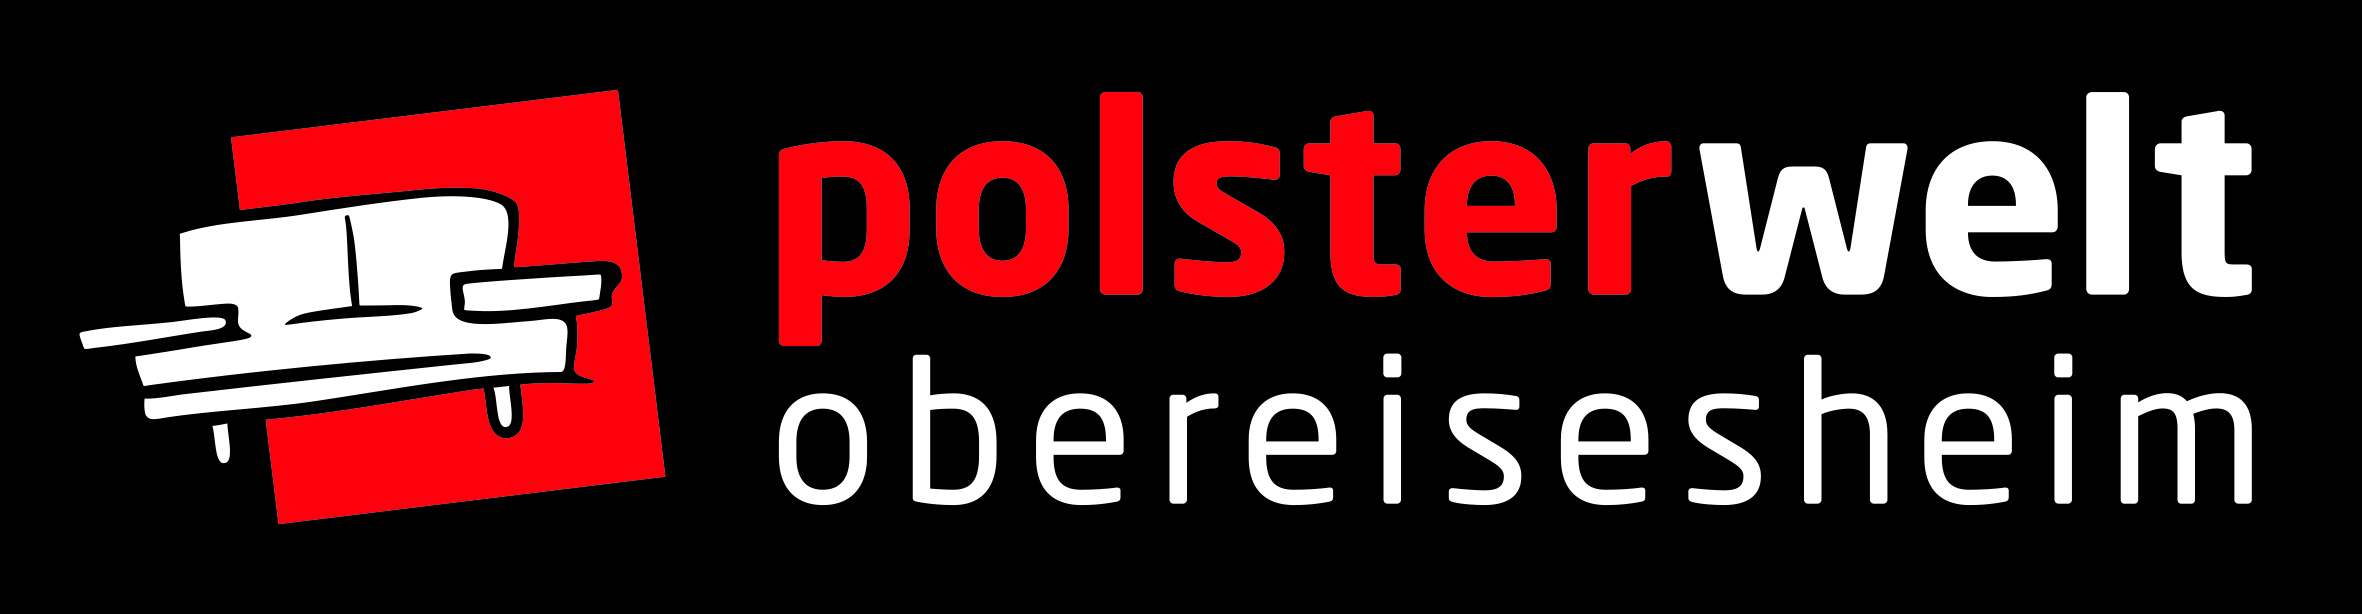 polsterwelt-obereisesheim-gmbh-neckarsulm-obereisesheim logo